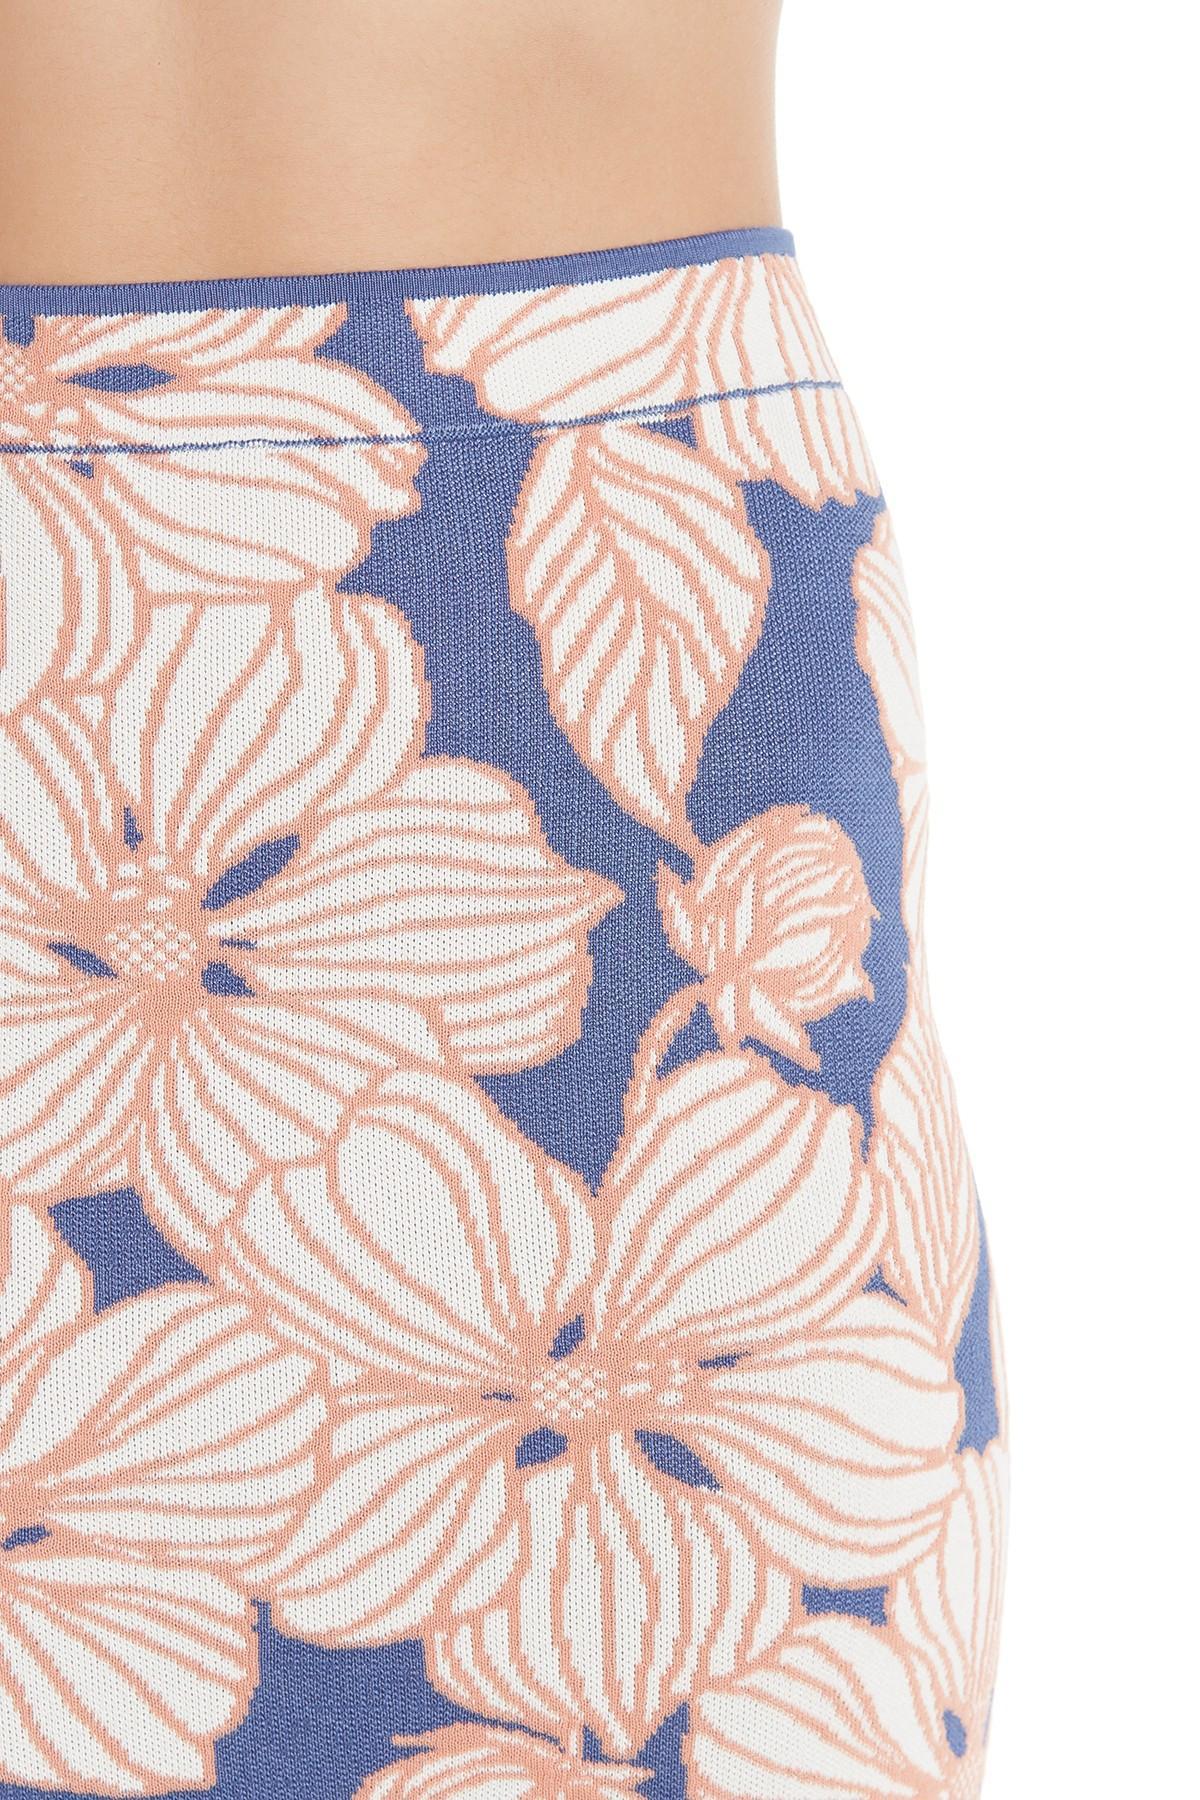 cf52d7bddd BCBGMAXAZRIA - Multicolor Floral Jacquard Skirt - Lyst. View fullscreen